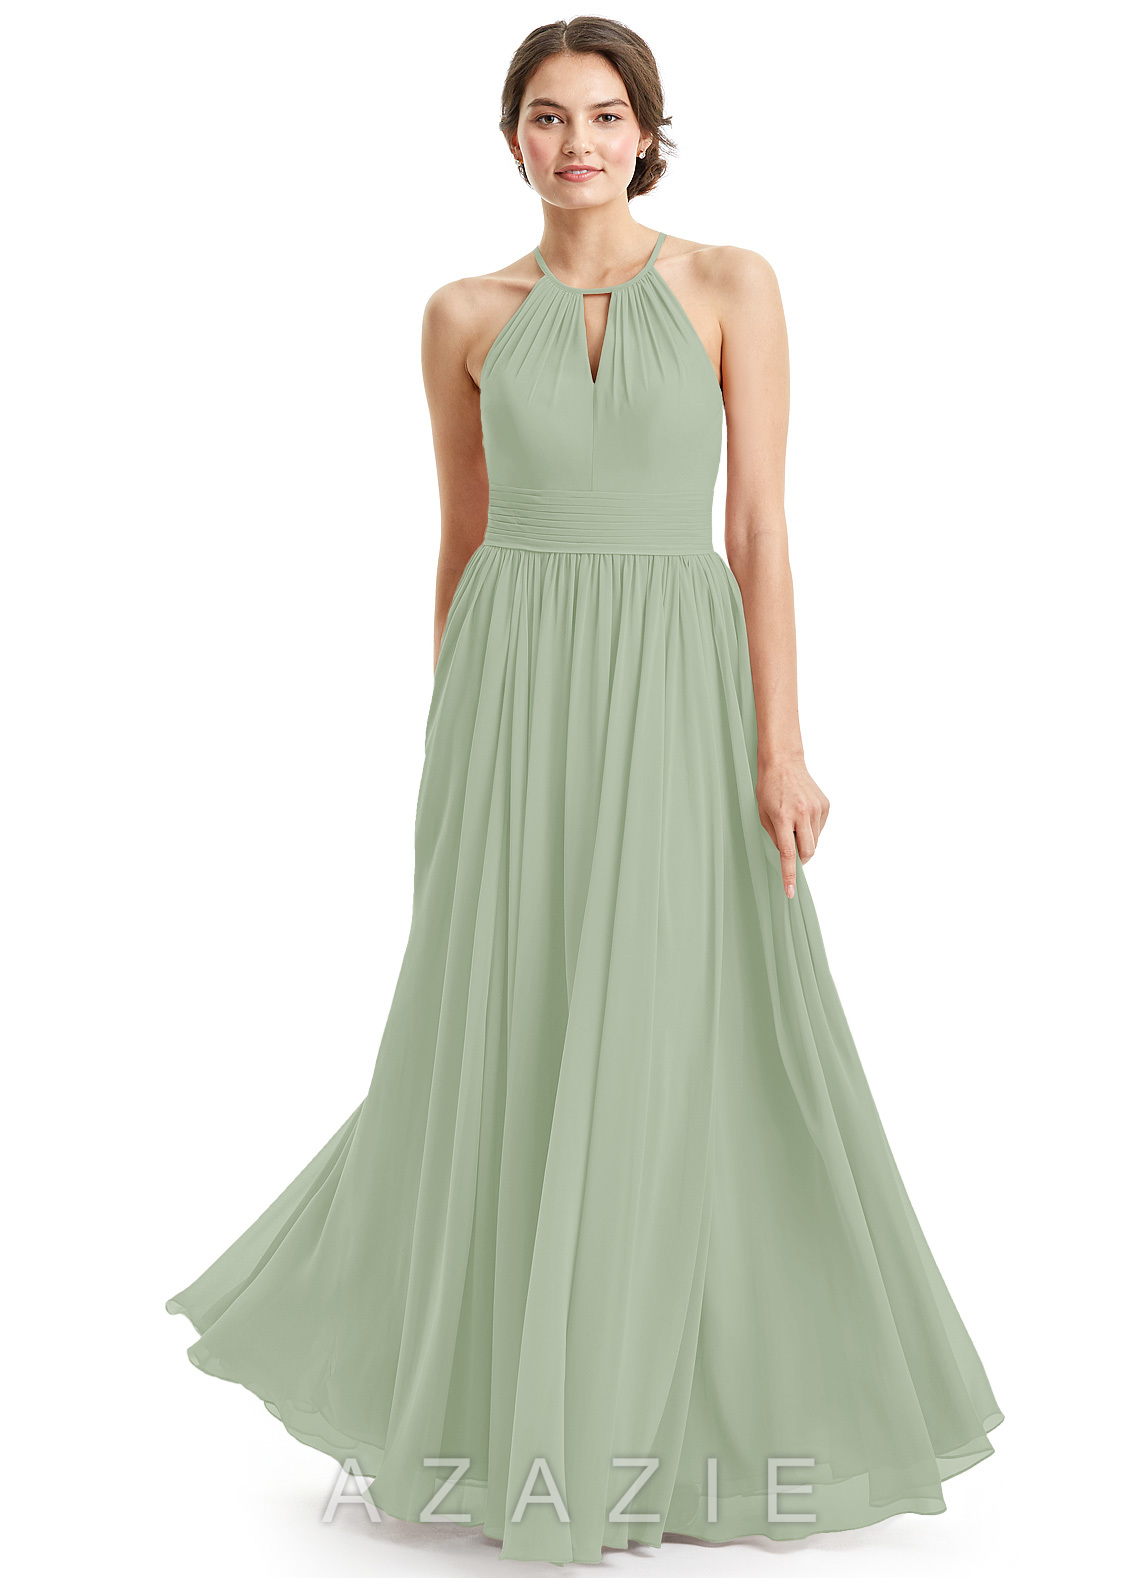 Dusty sage bridesmaid dresses dusty sage gowns azazie azazie cherish azazie cherish ombrellifo Image collections